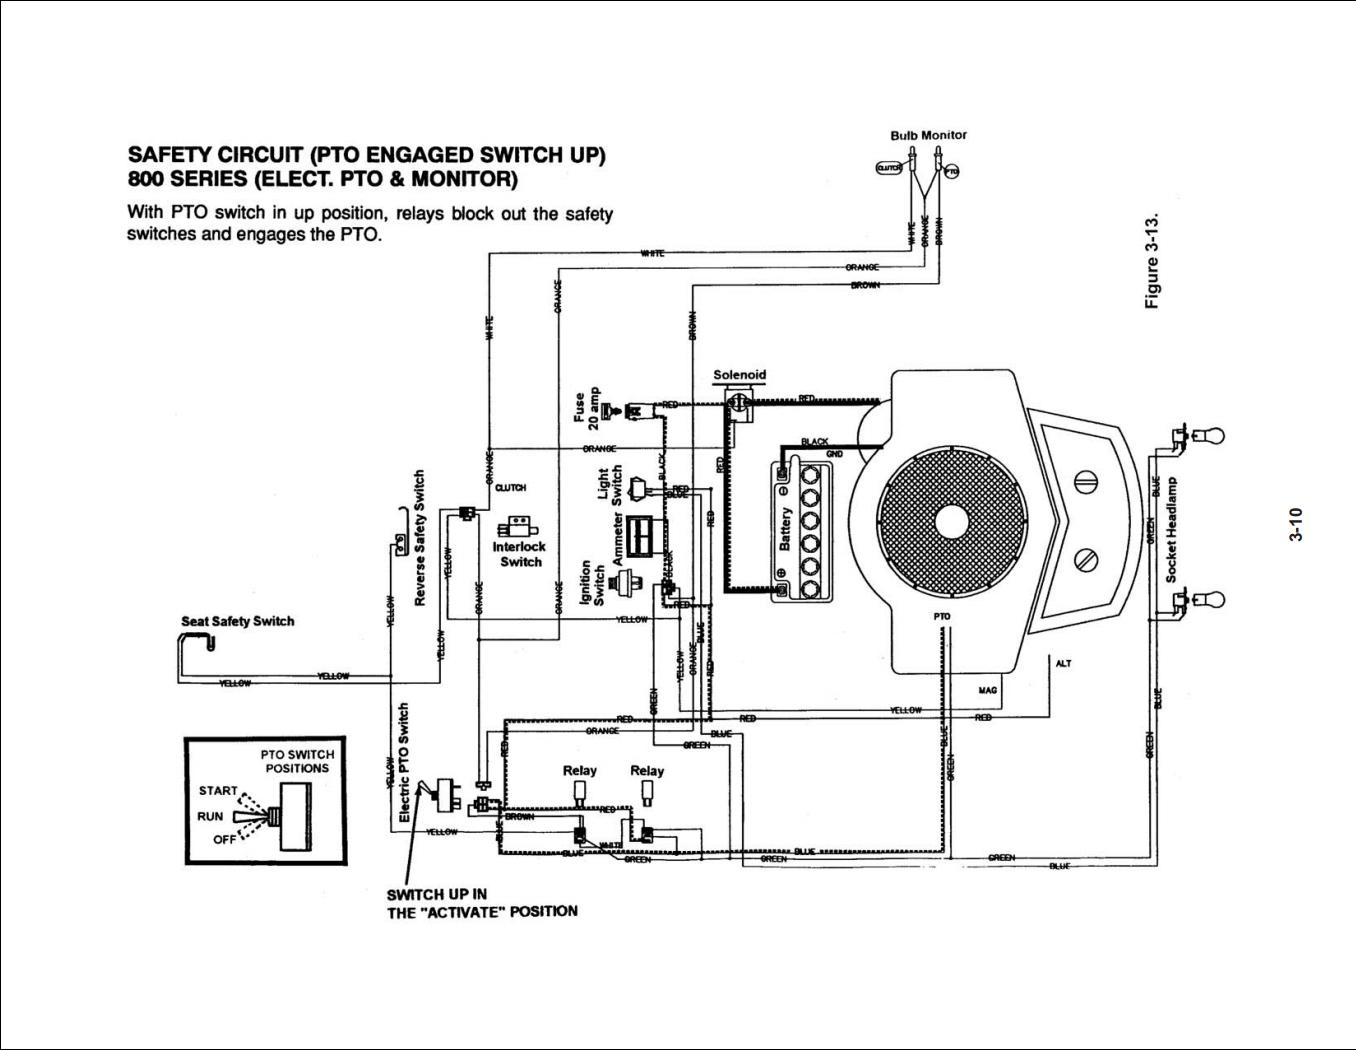 18 Hp Briggs Vanguard Wiring Diagram - Www.toyskids.co • - Briggs And Stratton Wiring Diagram 18 Hp